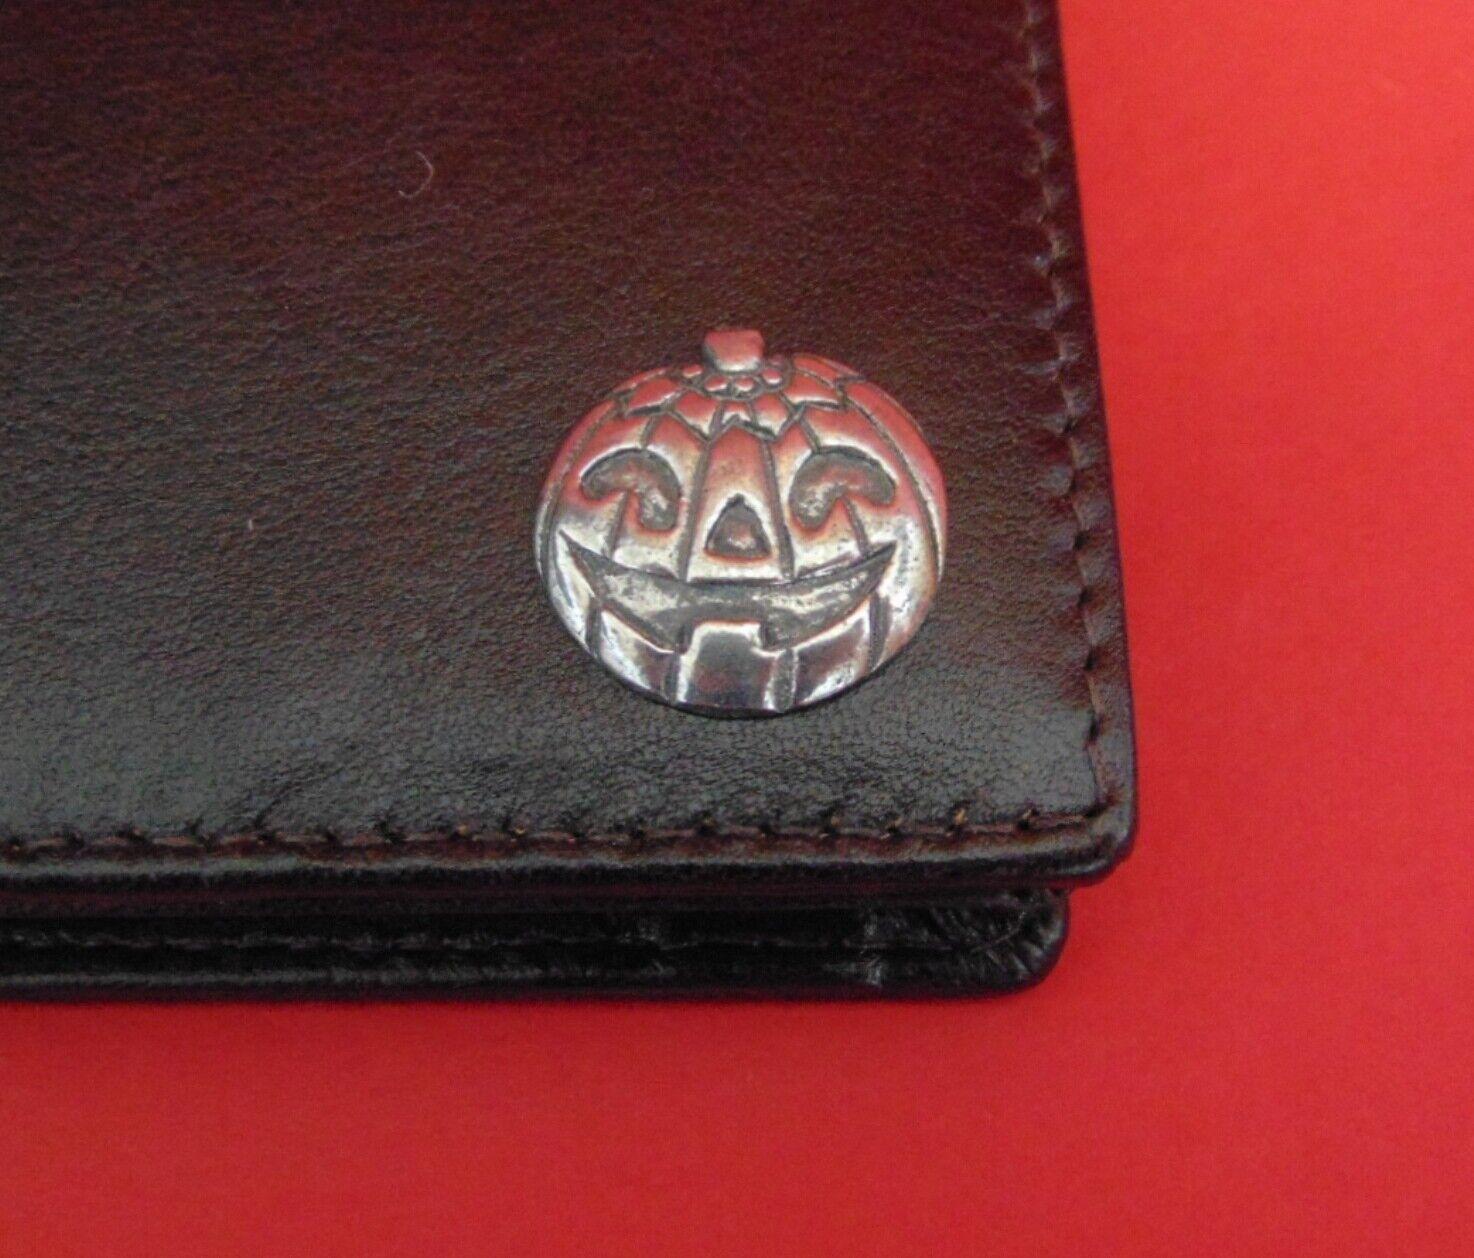 Pumpkin Design Dark Brown Real Leather Wallet Halloween Gift Dad Christmas Gift